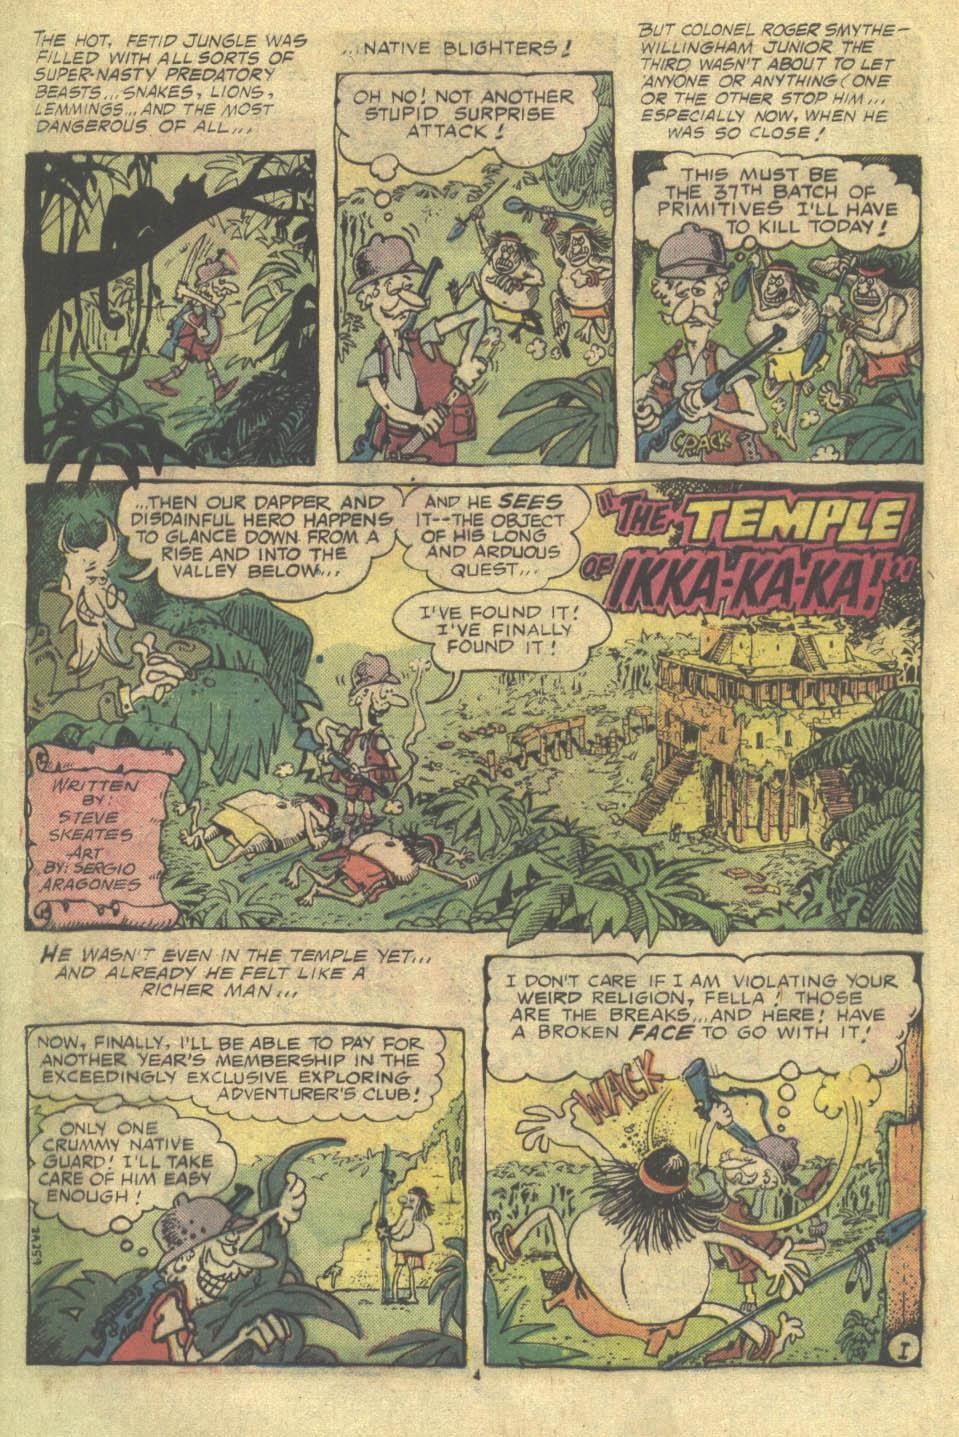 Read online Plop! comic -  Issue #9 - 5